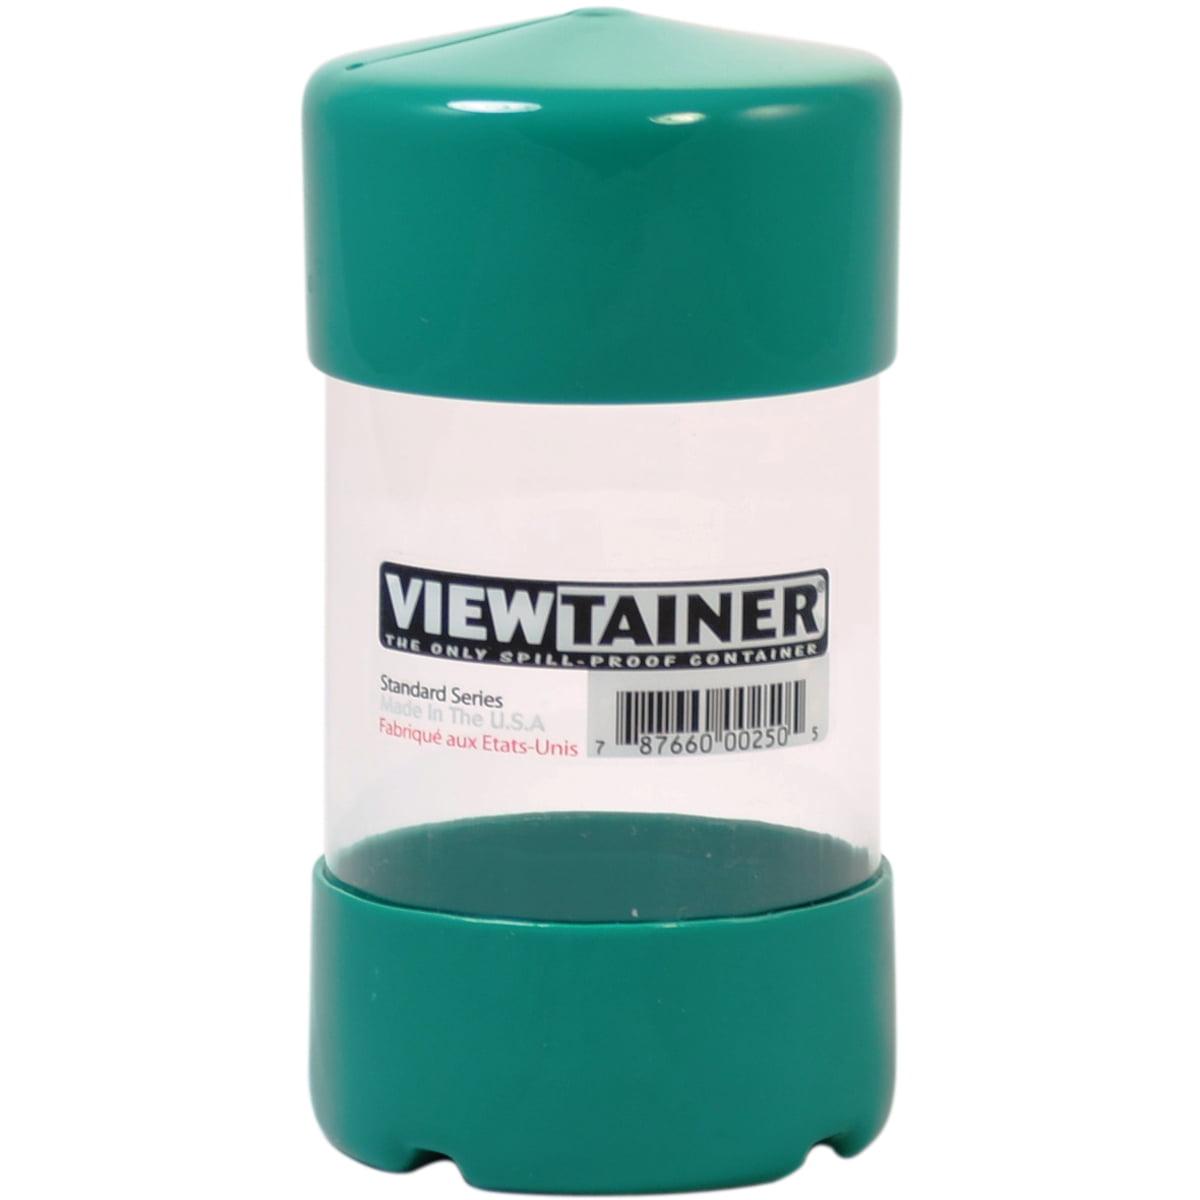 "Viewtainer Storage Container, 2-3/4"" x 5"""